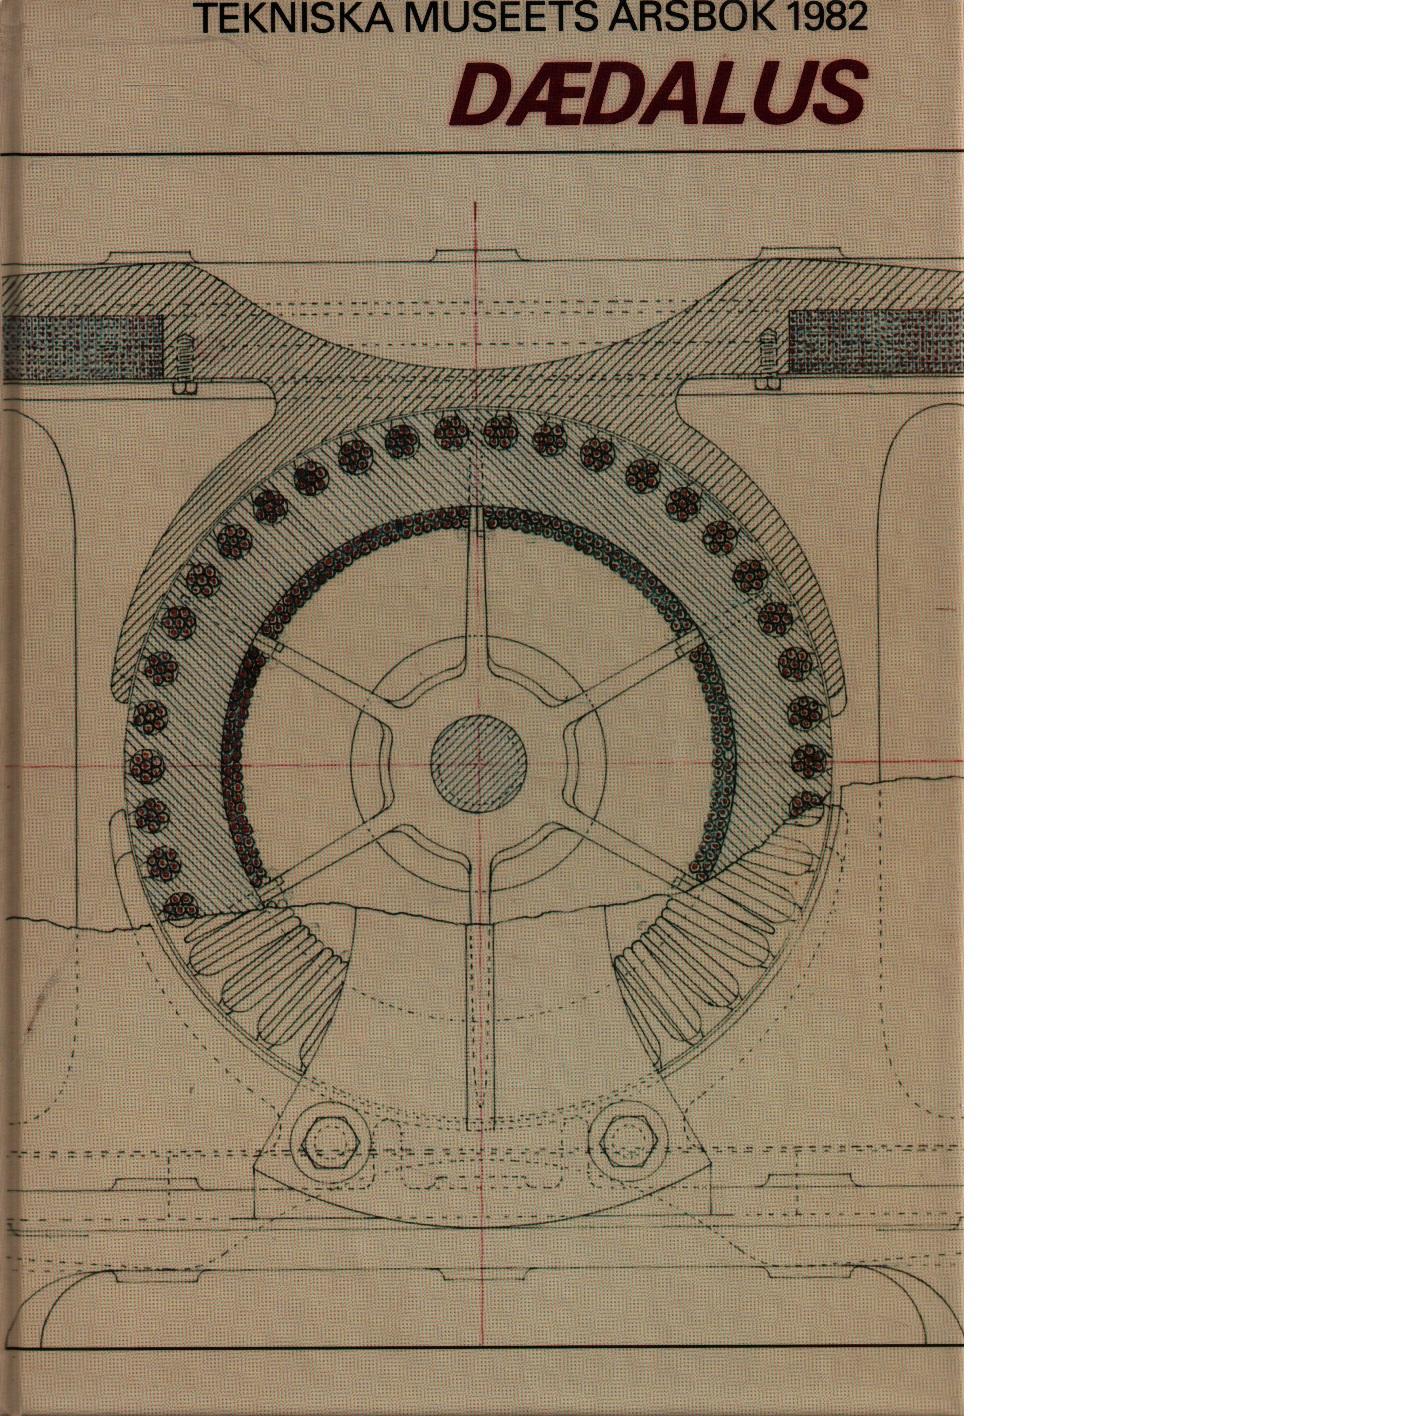 Tekniska museets årsbok. Årg. 51 - Dædalus